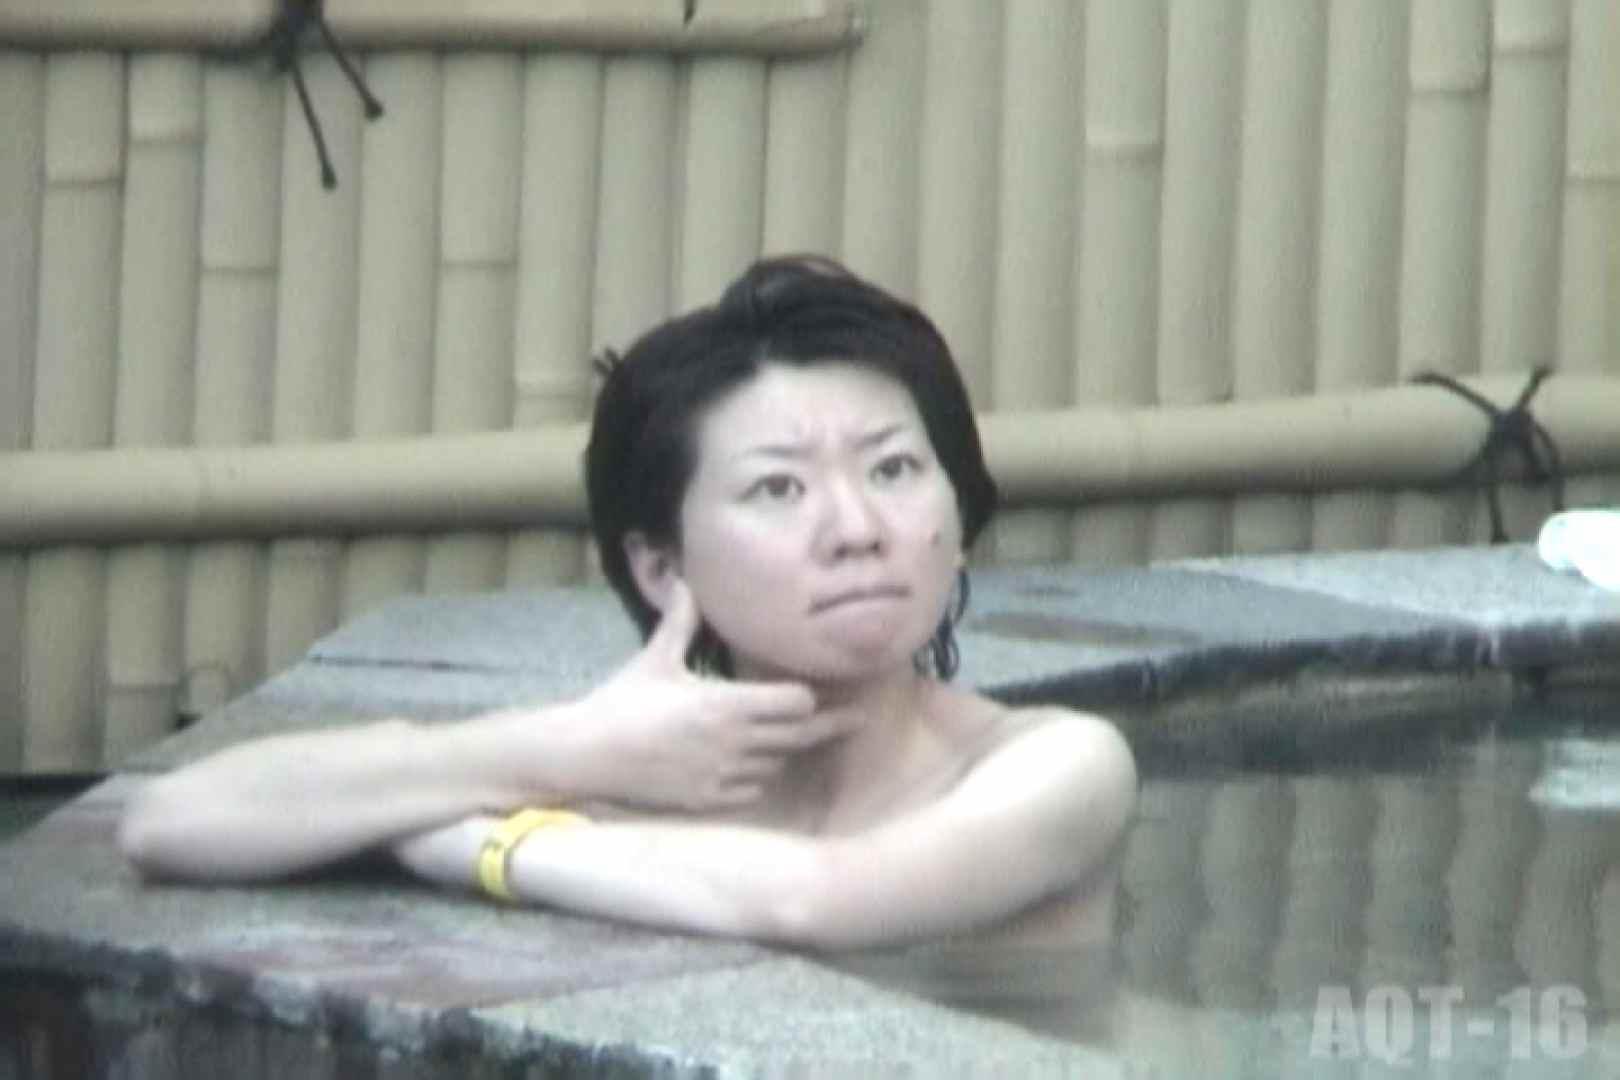 Aquaな露天風呂Vol.842 露天風呂編  82PIX 6